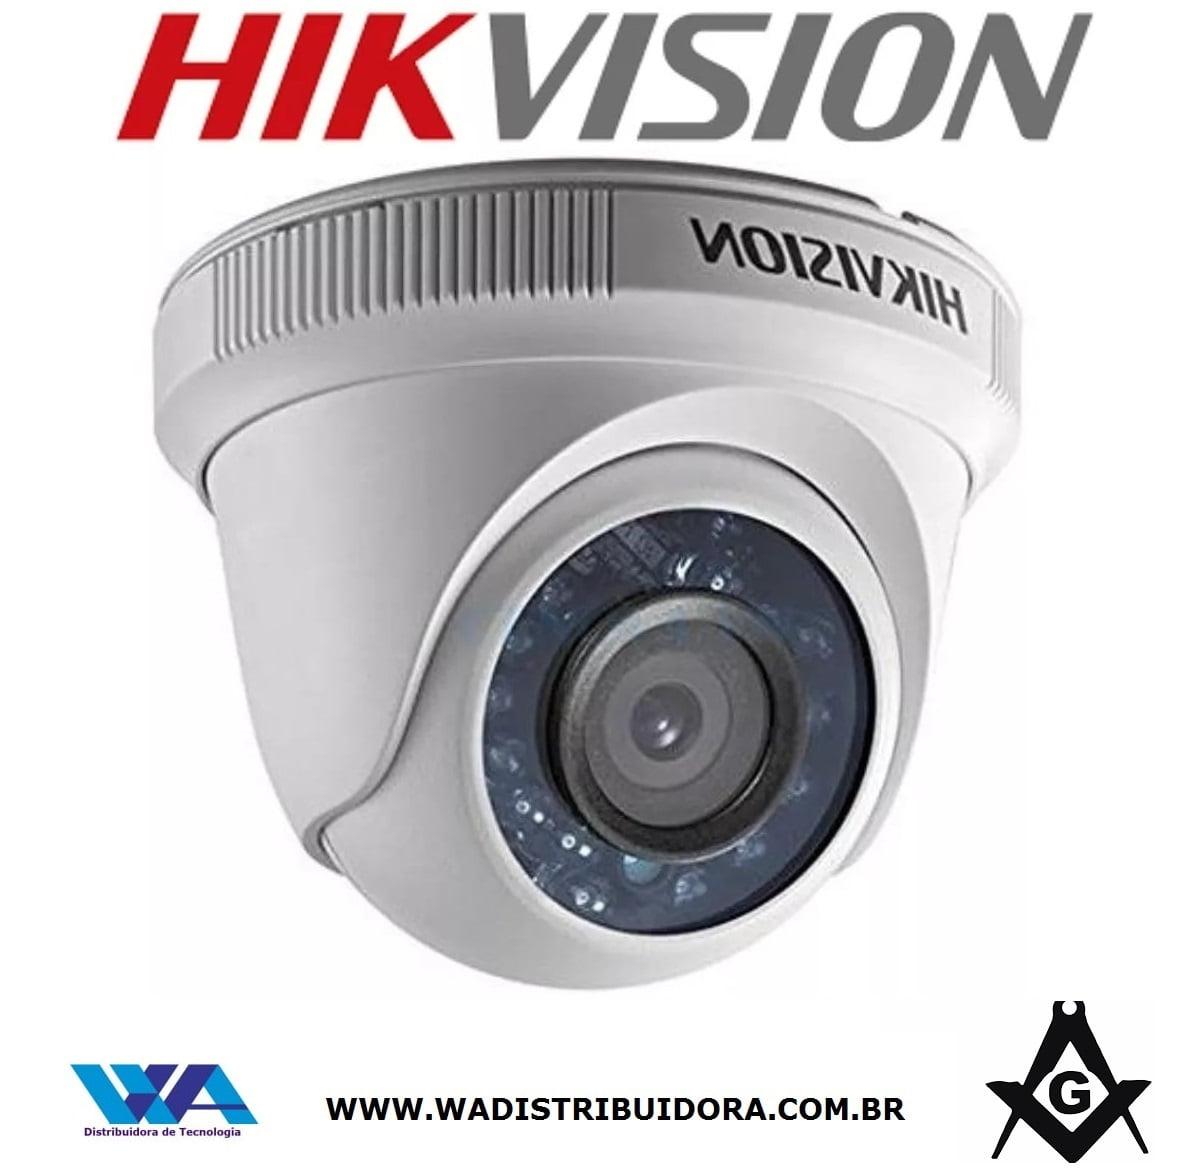 Câmera de segurança Dome infra 15mts full hd 1080P TVI-CVBS Lente 3,6mm hikvision Ds-2ce5ad0t-irp